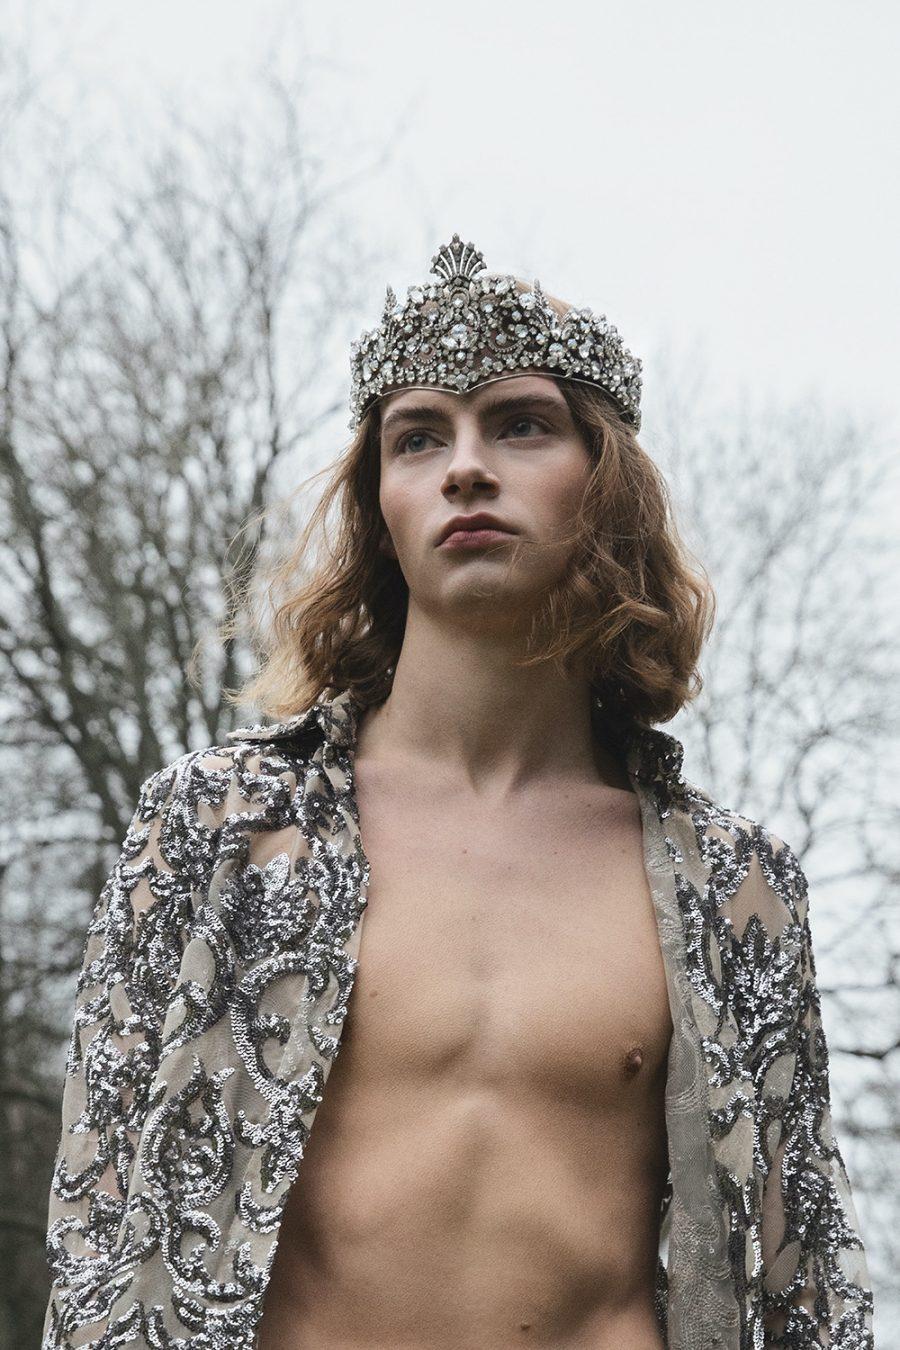 Leonard wears crown Caroline Svedbom and shirt LAZOSCHMIDL.